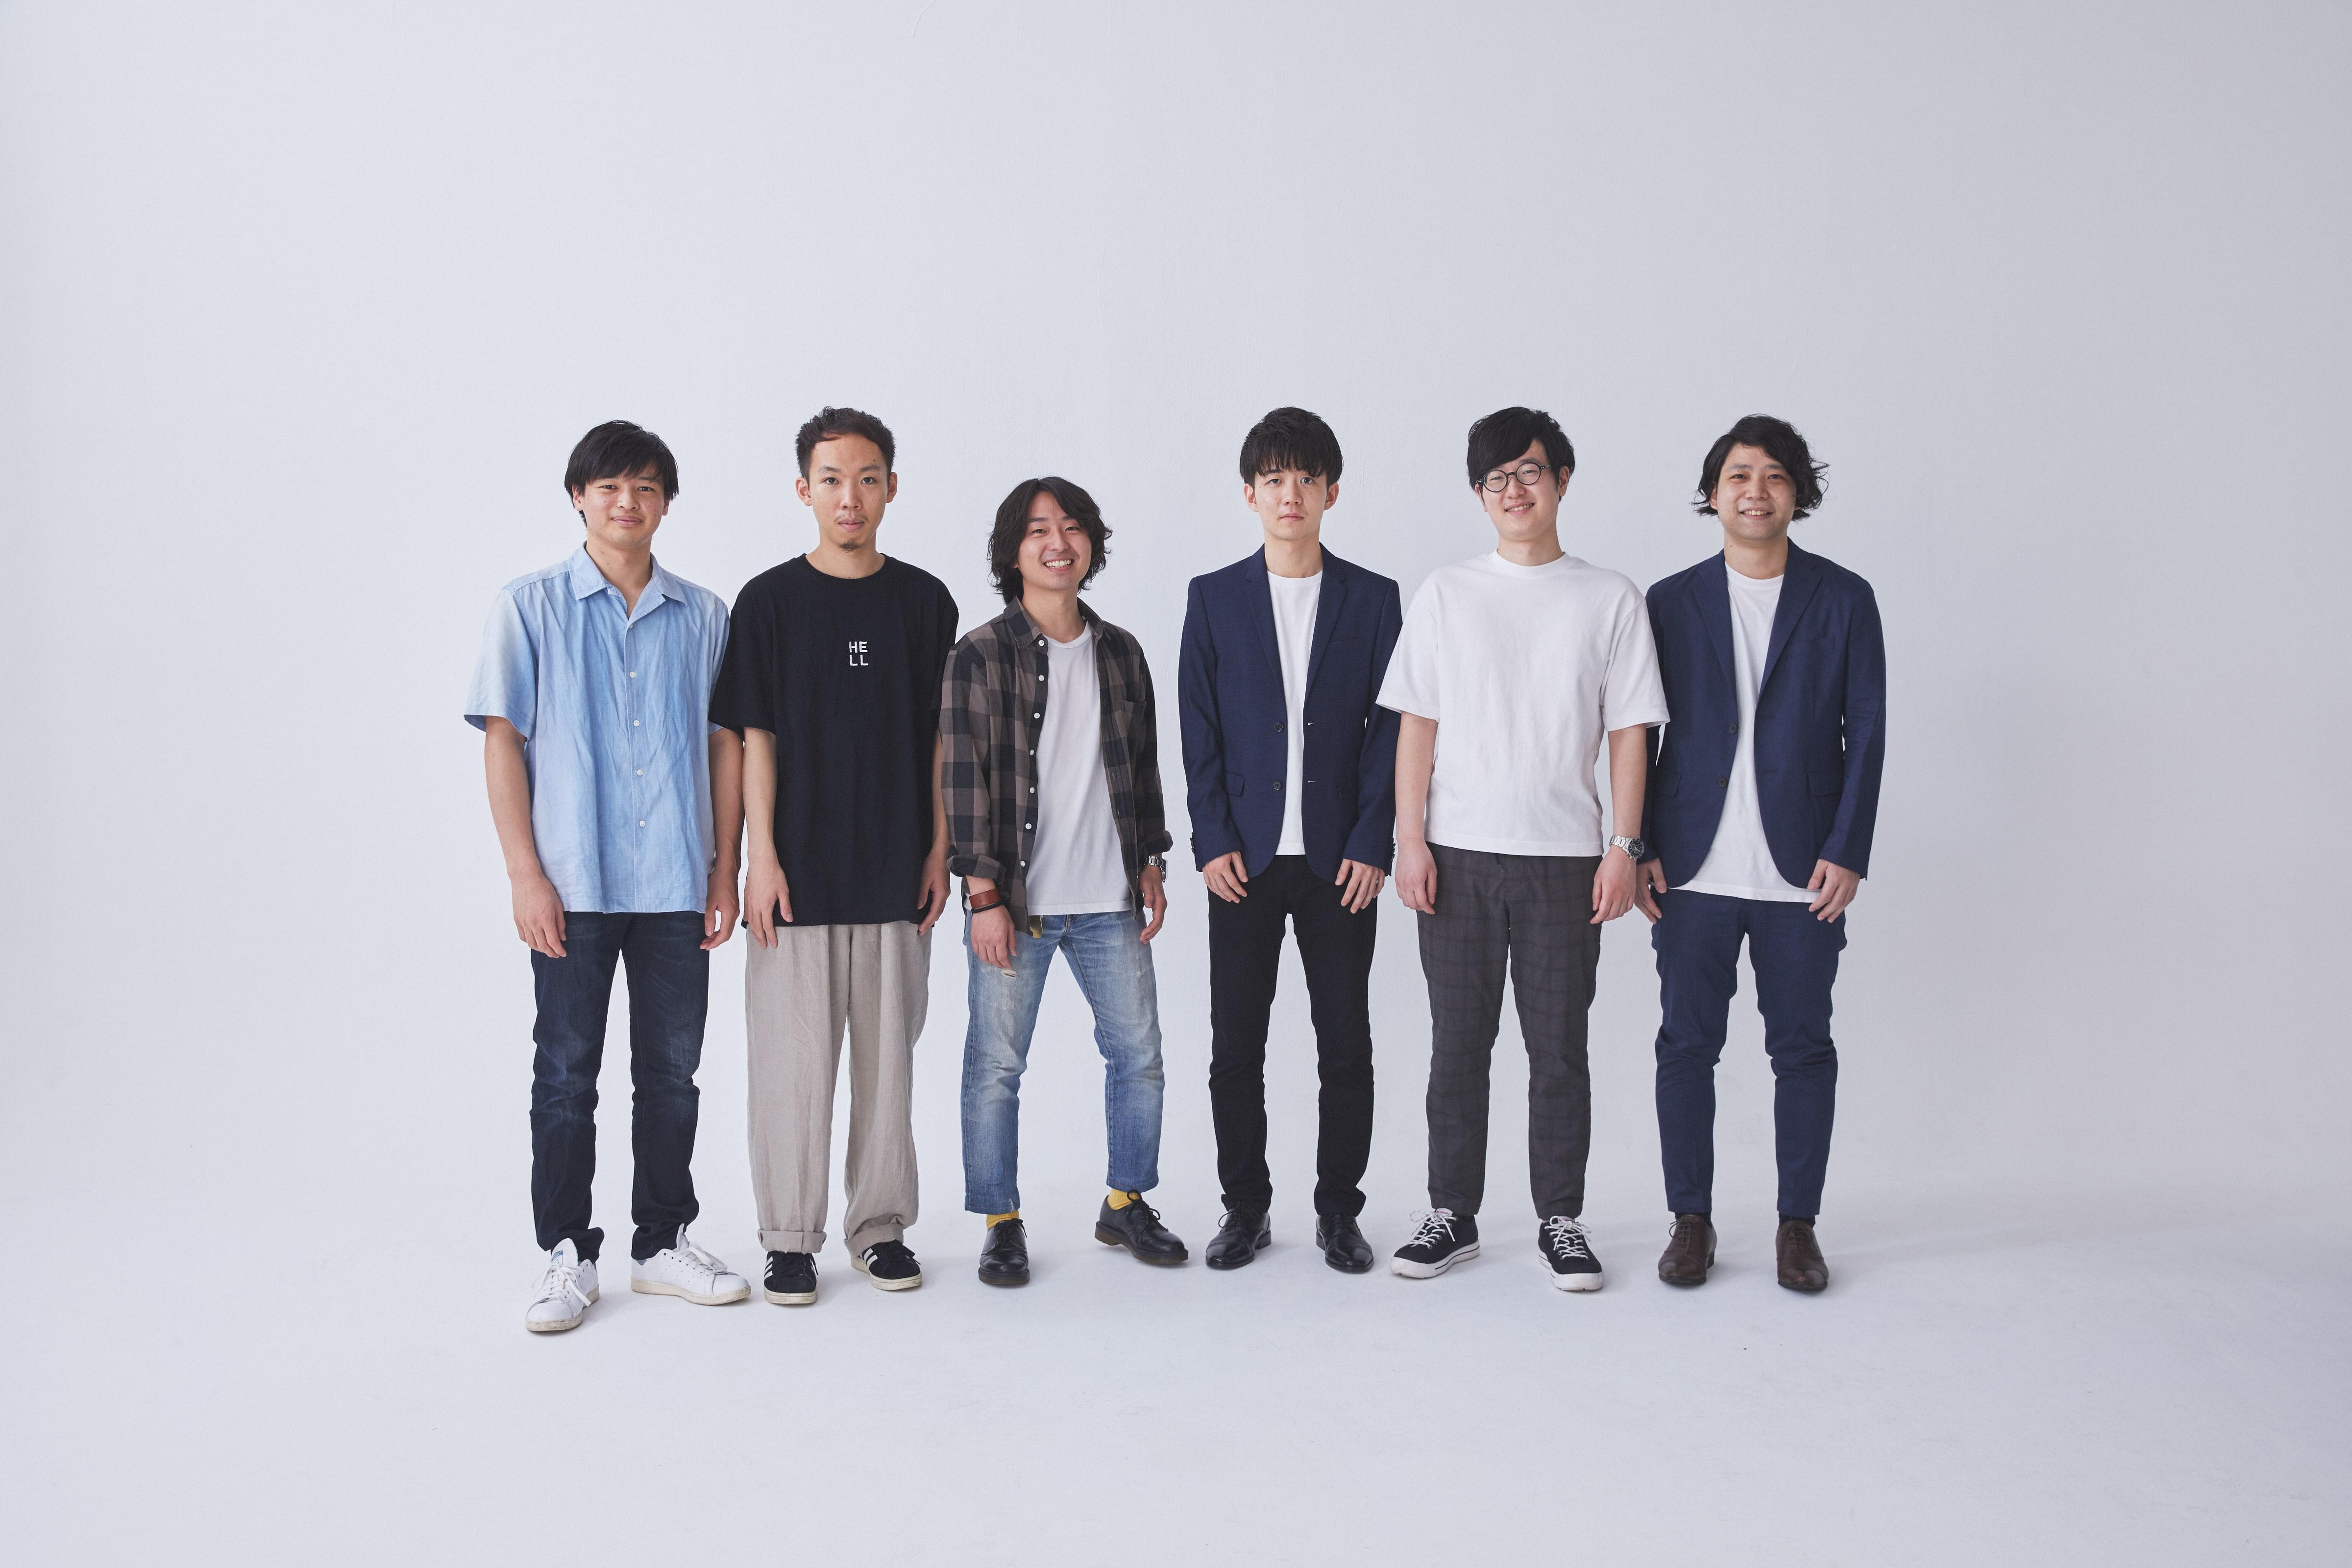 【Web】サービスグロースエンジニア